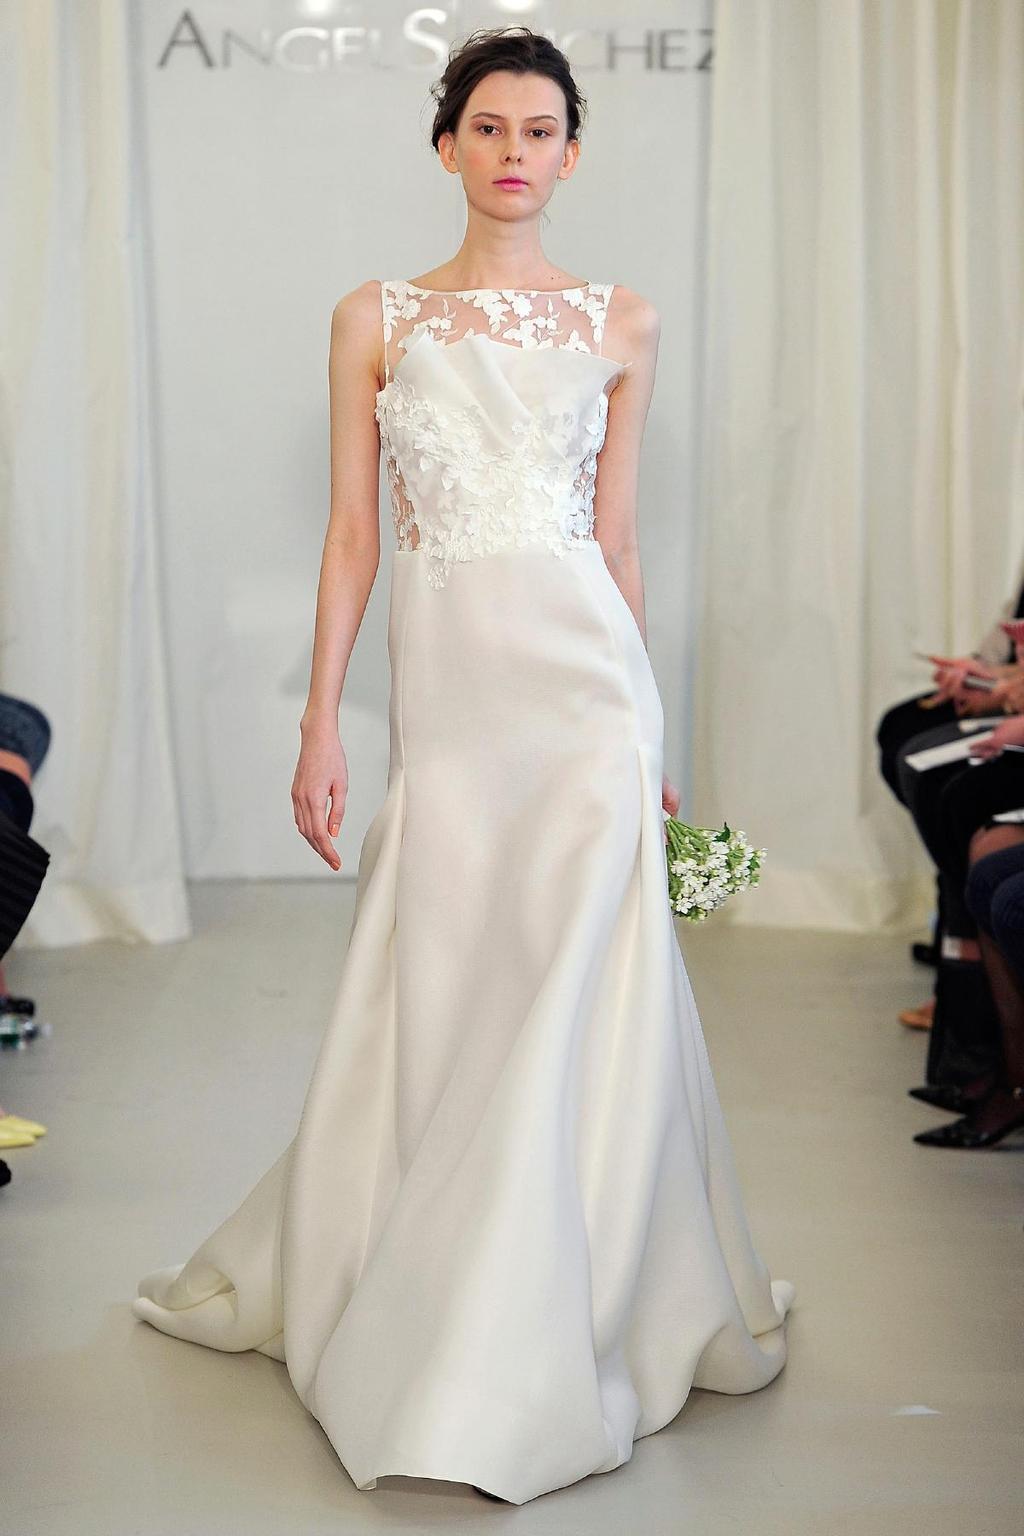 Angel-sanchez-wedding-dress-spring-2014-bridal-11.full